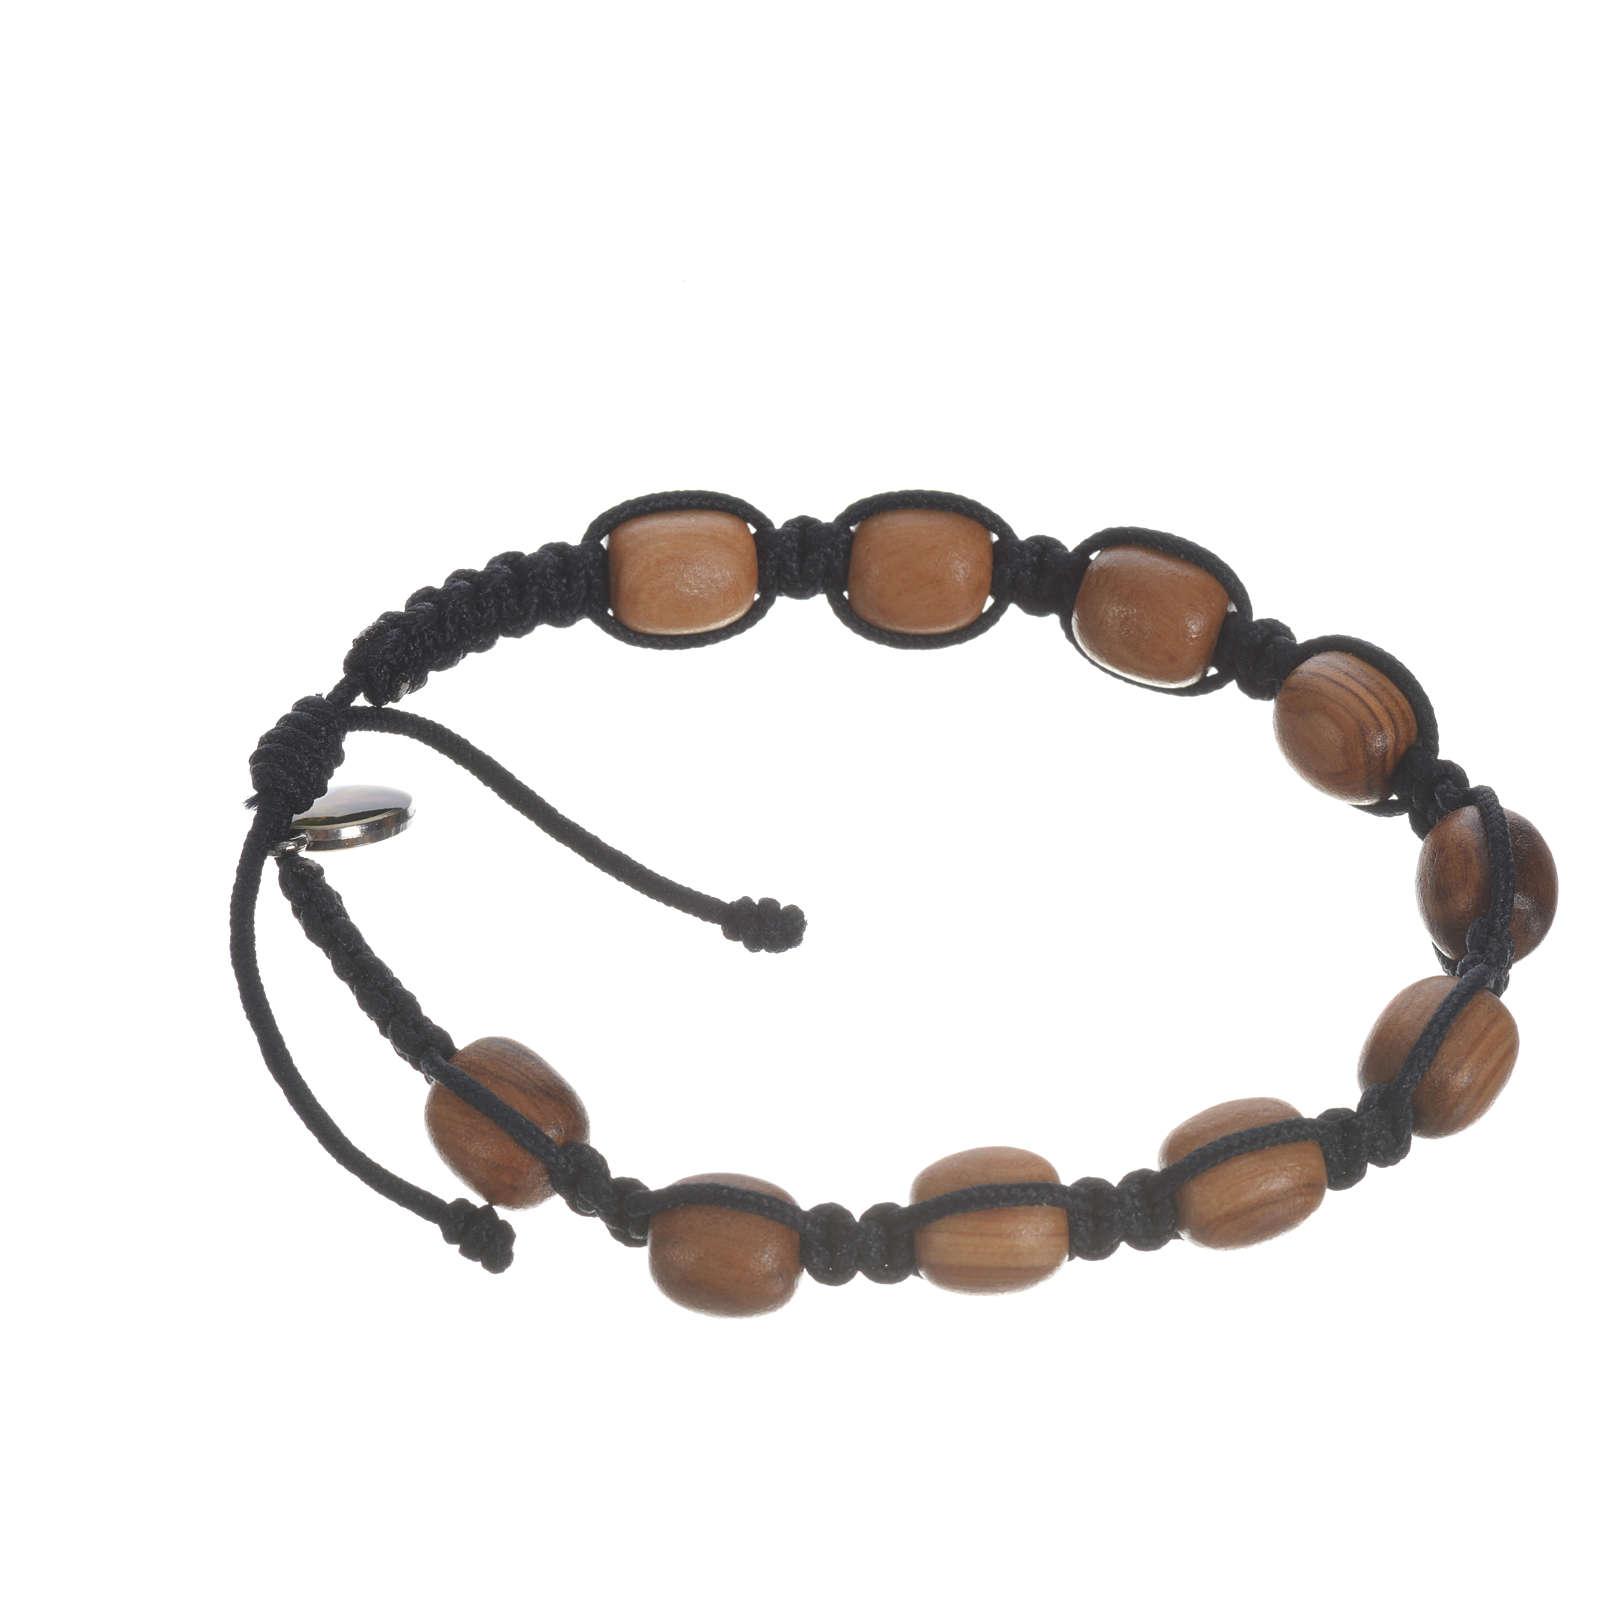 Bracelet perles en bois d'olivier 9 mm sur corde 4